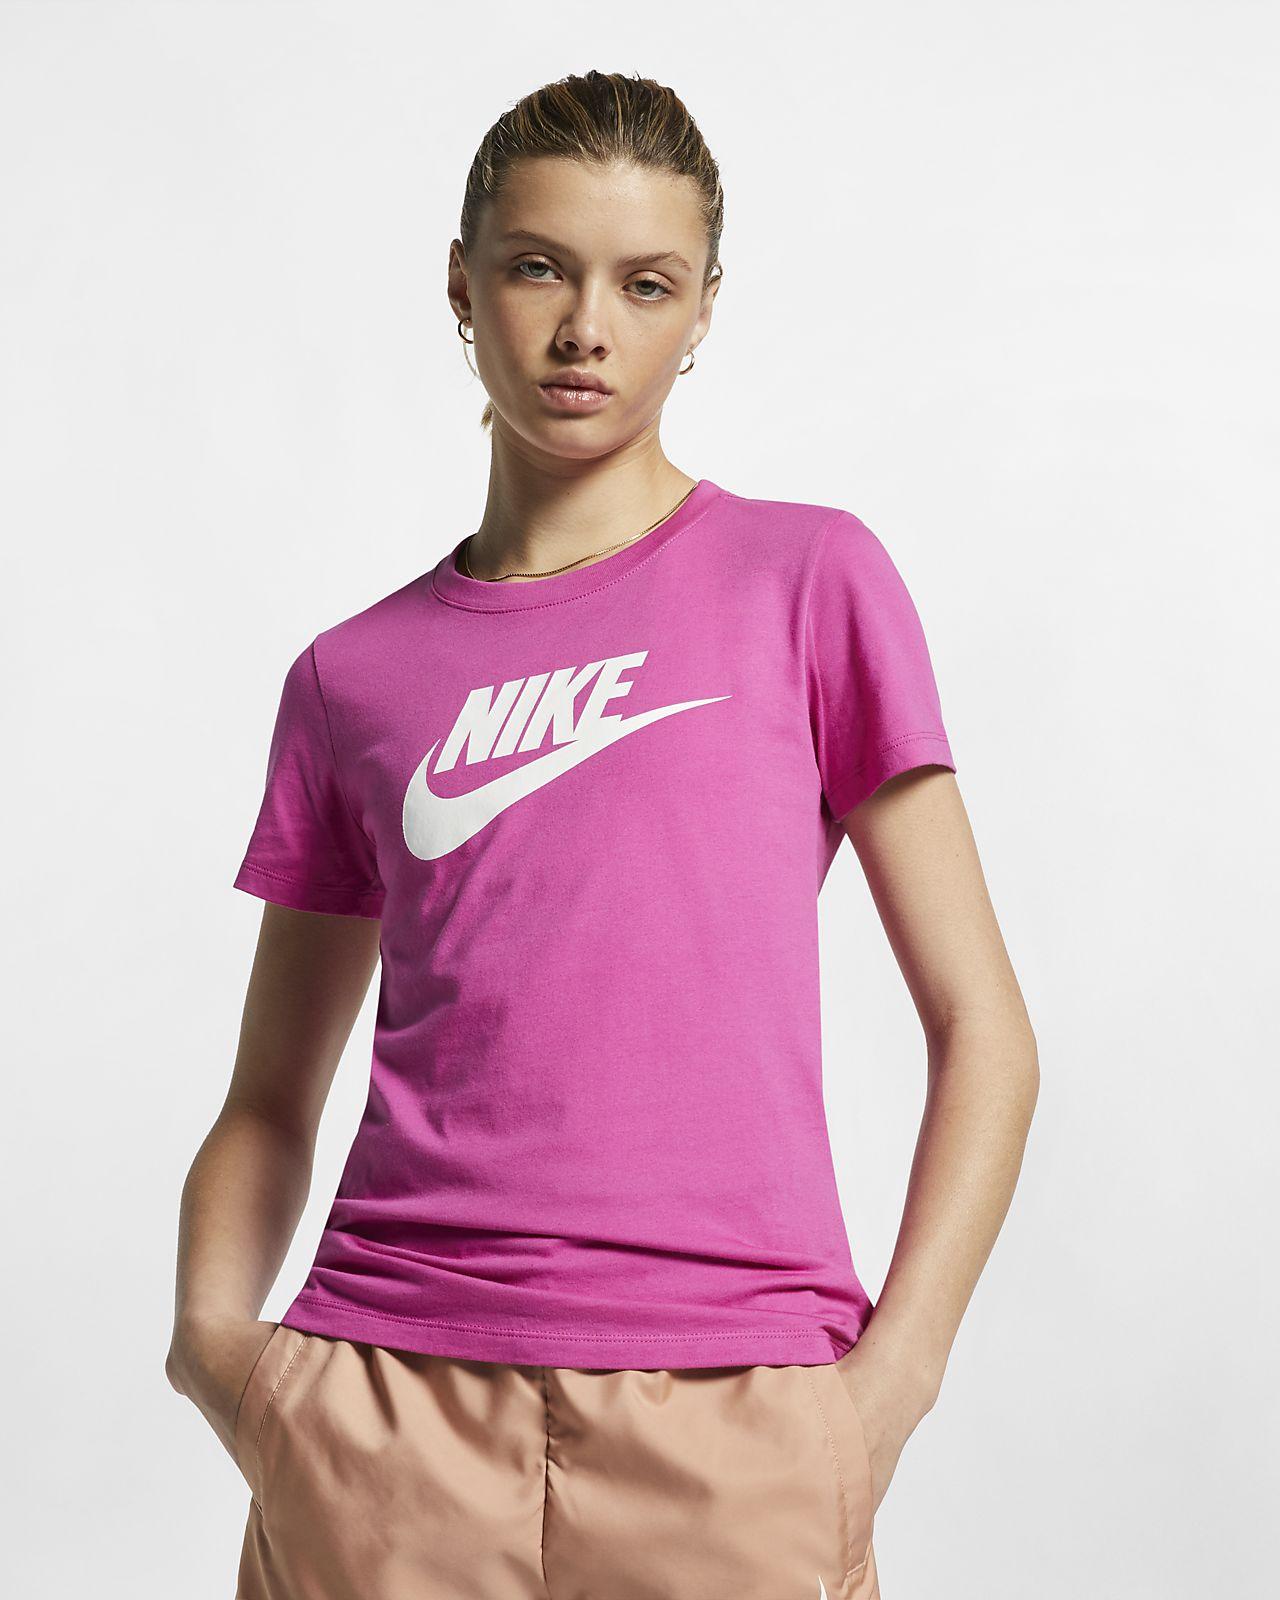 new style 2bd38 41640 ... Nike Sportswear Essential Women s T-Shirt